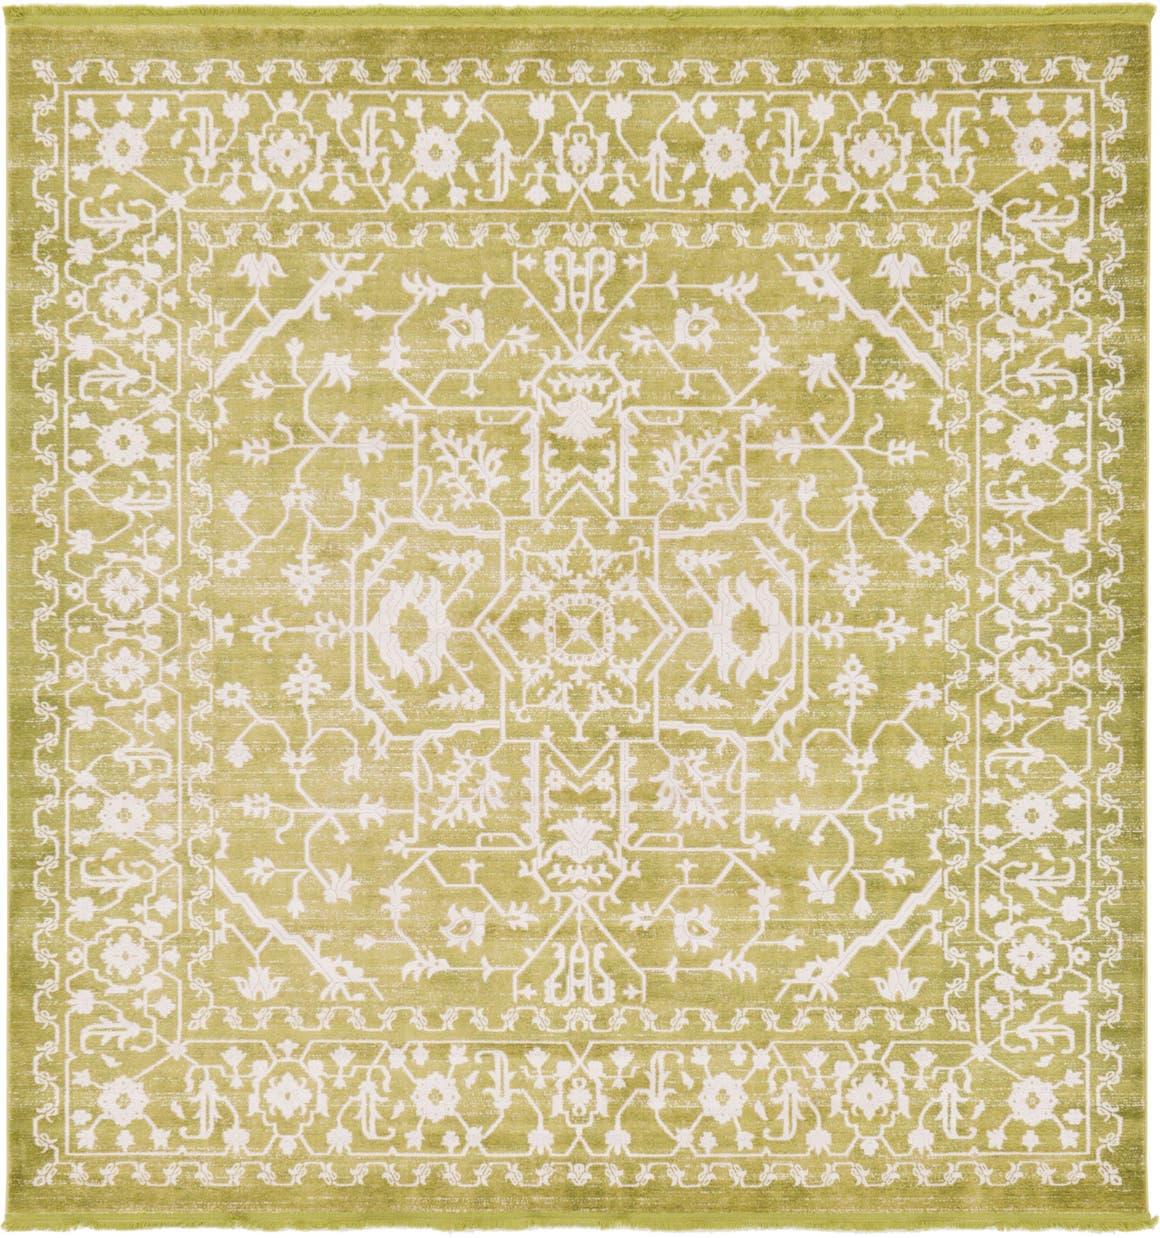 8' x 8' New Vintage Square Rug main image